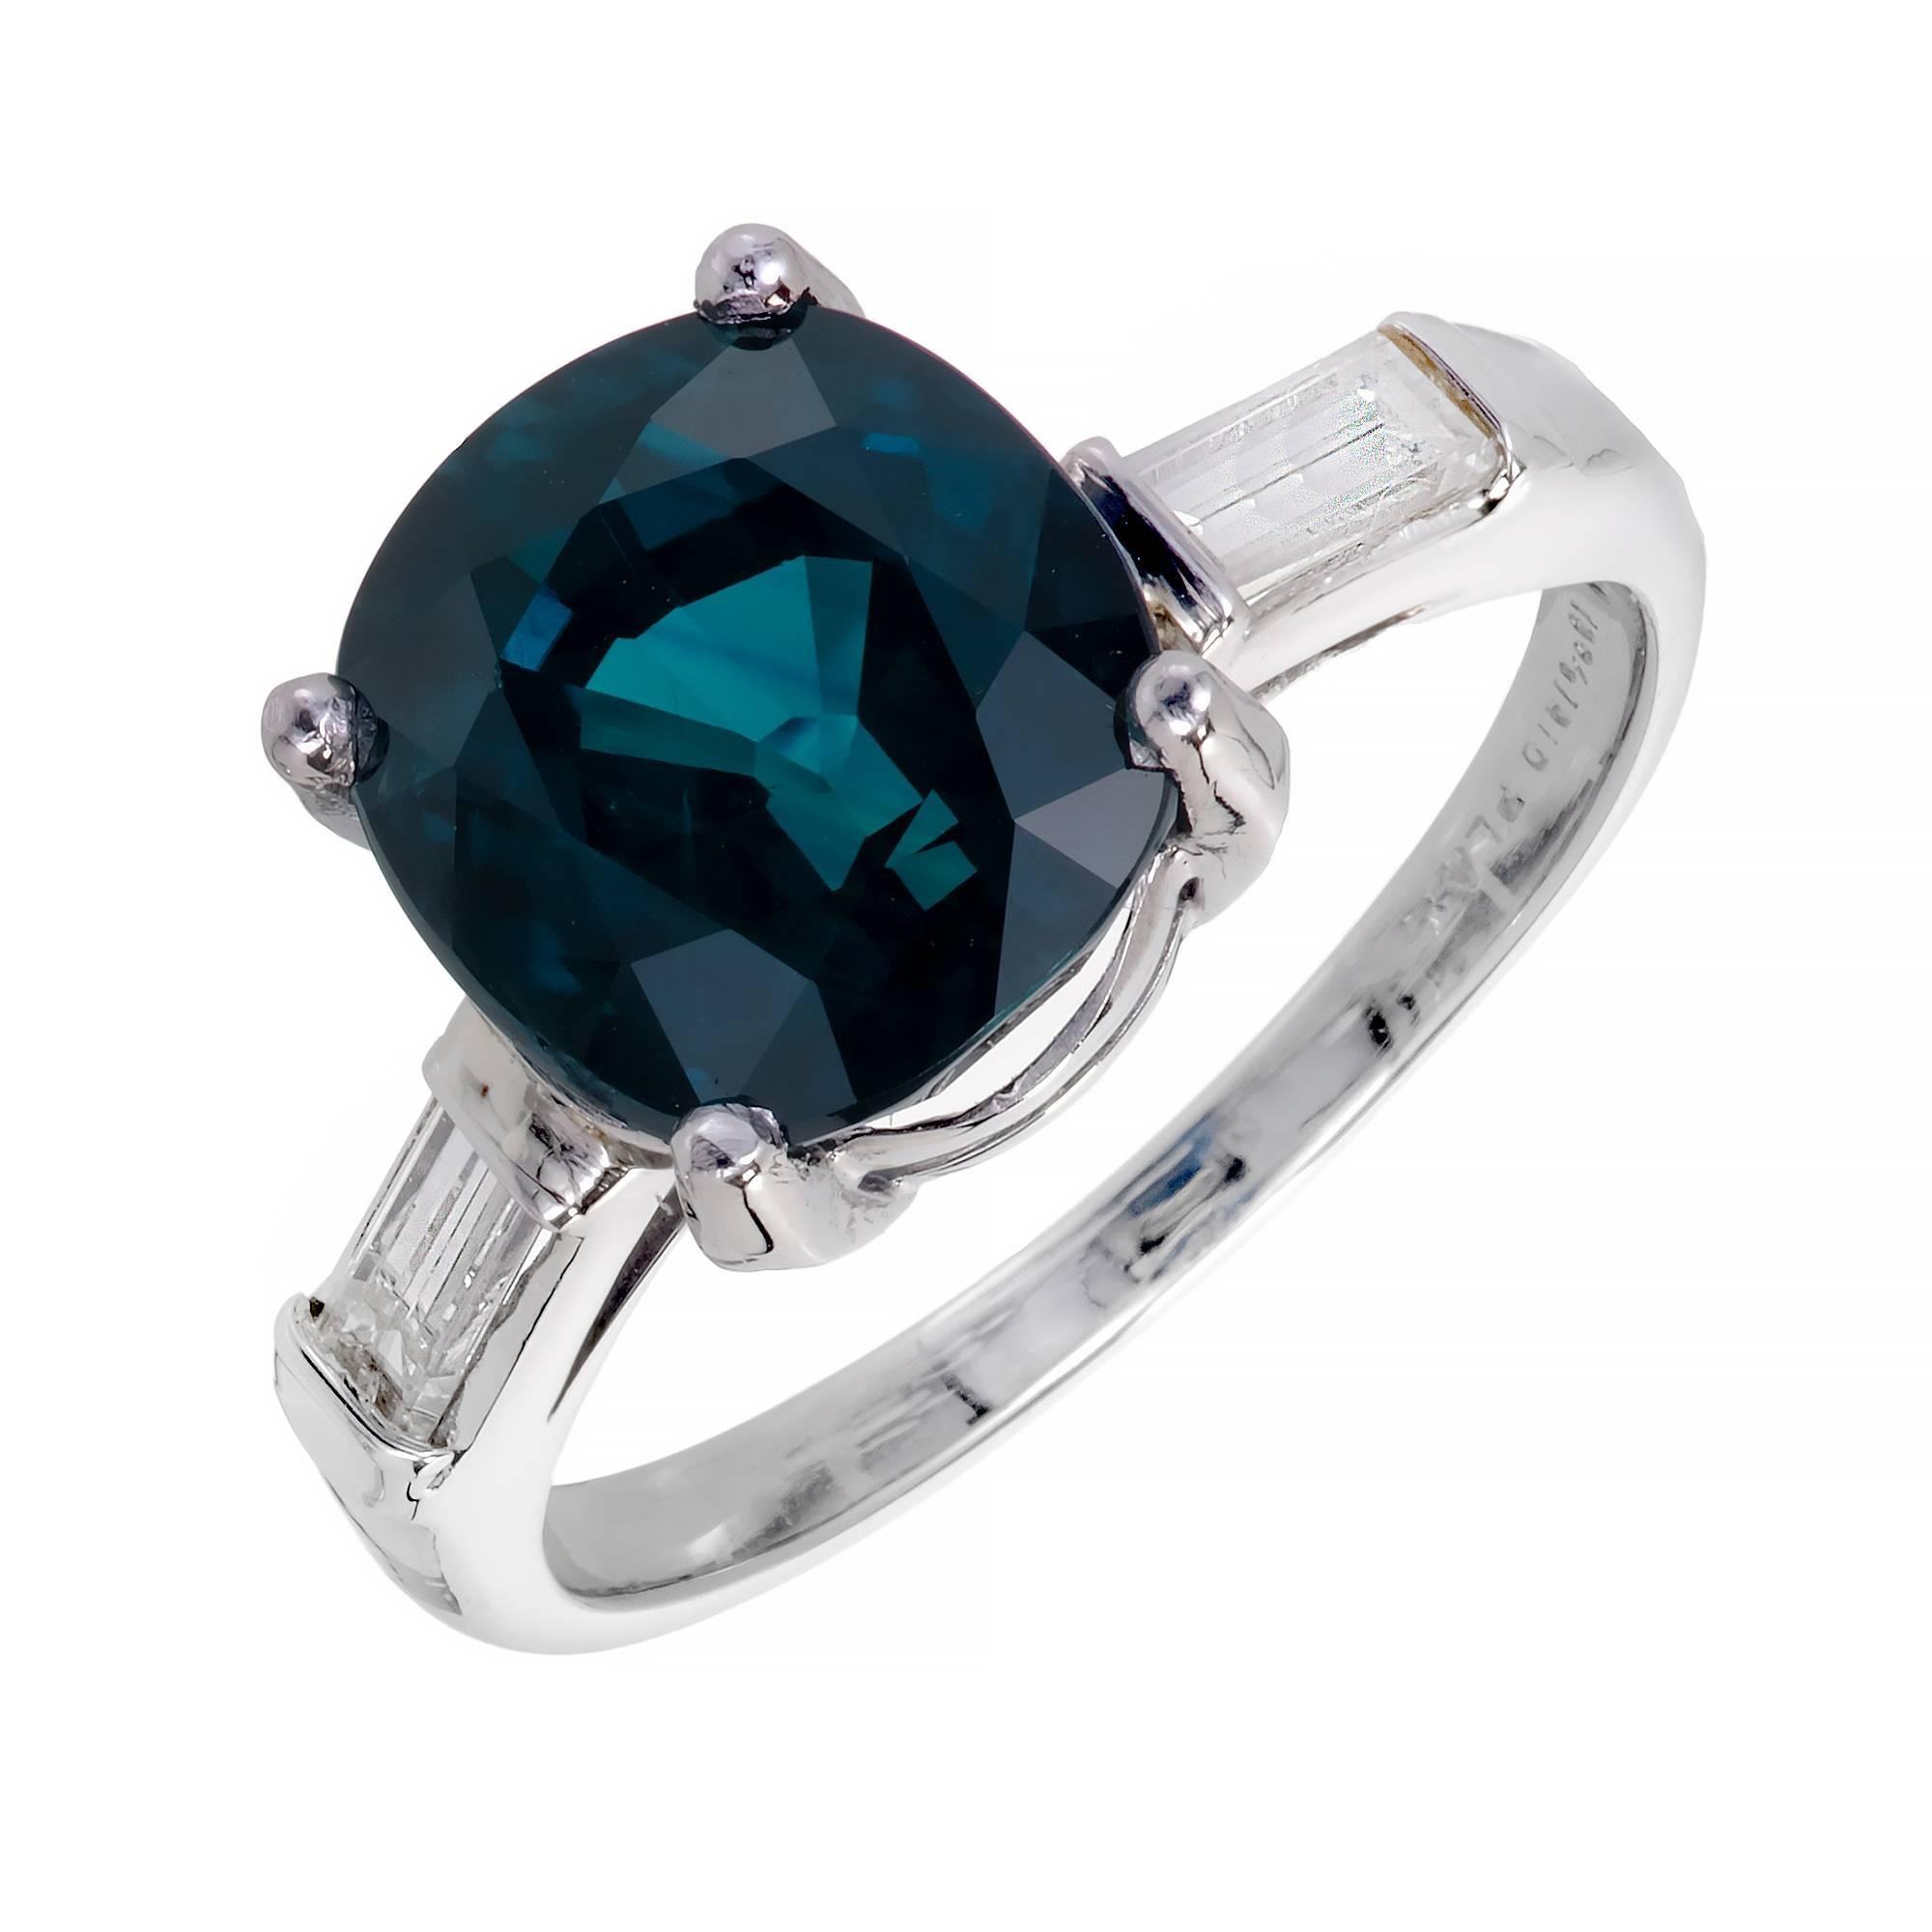 GIA Certified 6.07 Carat Sapphire Diamond Platinum Engagement Ring